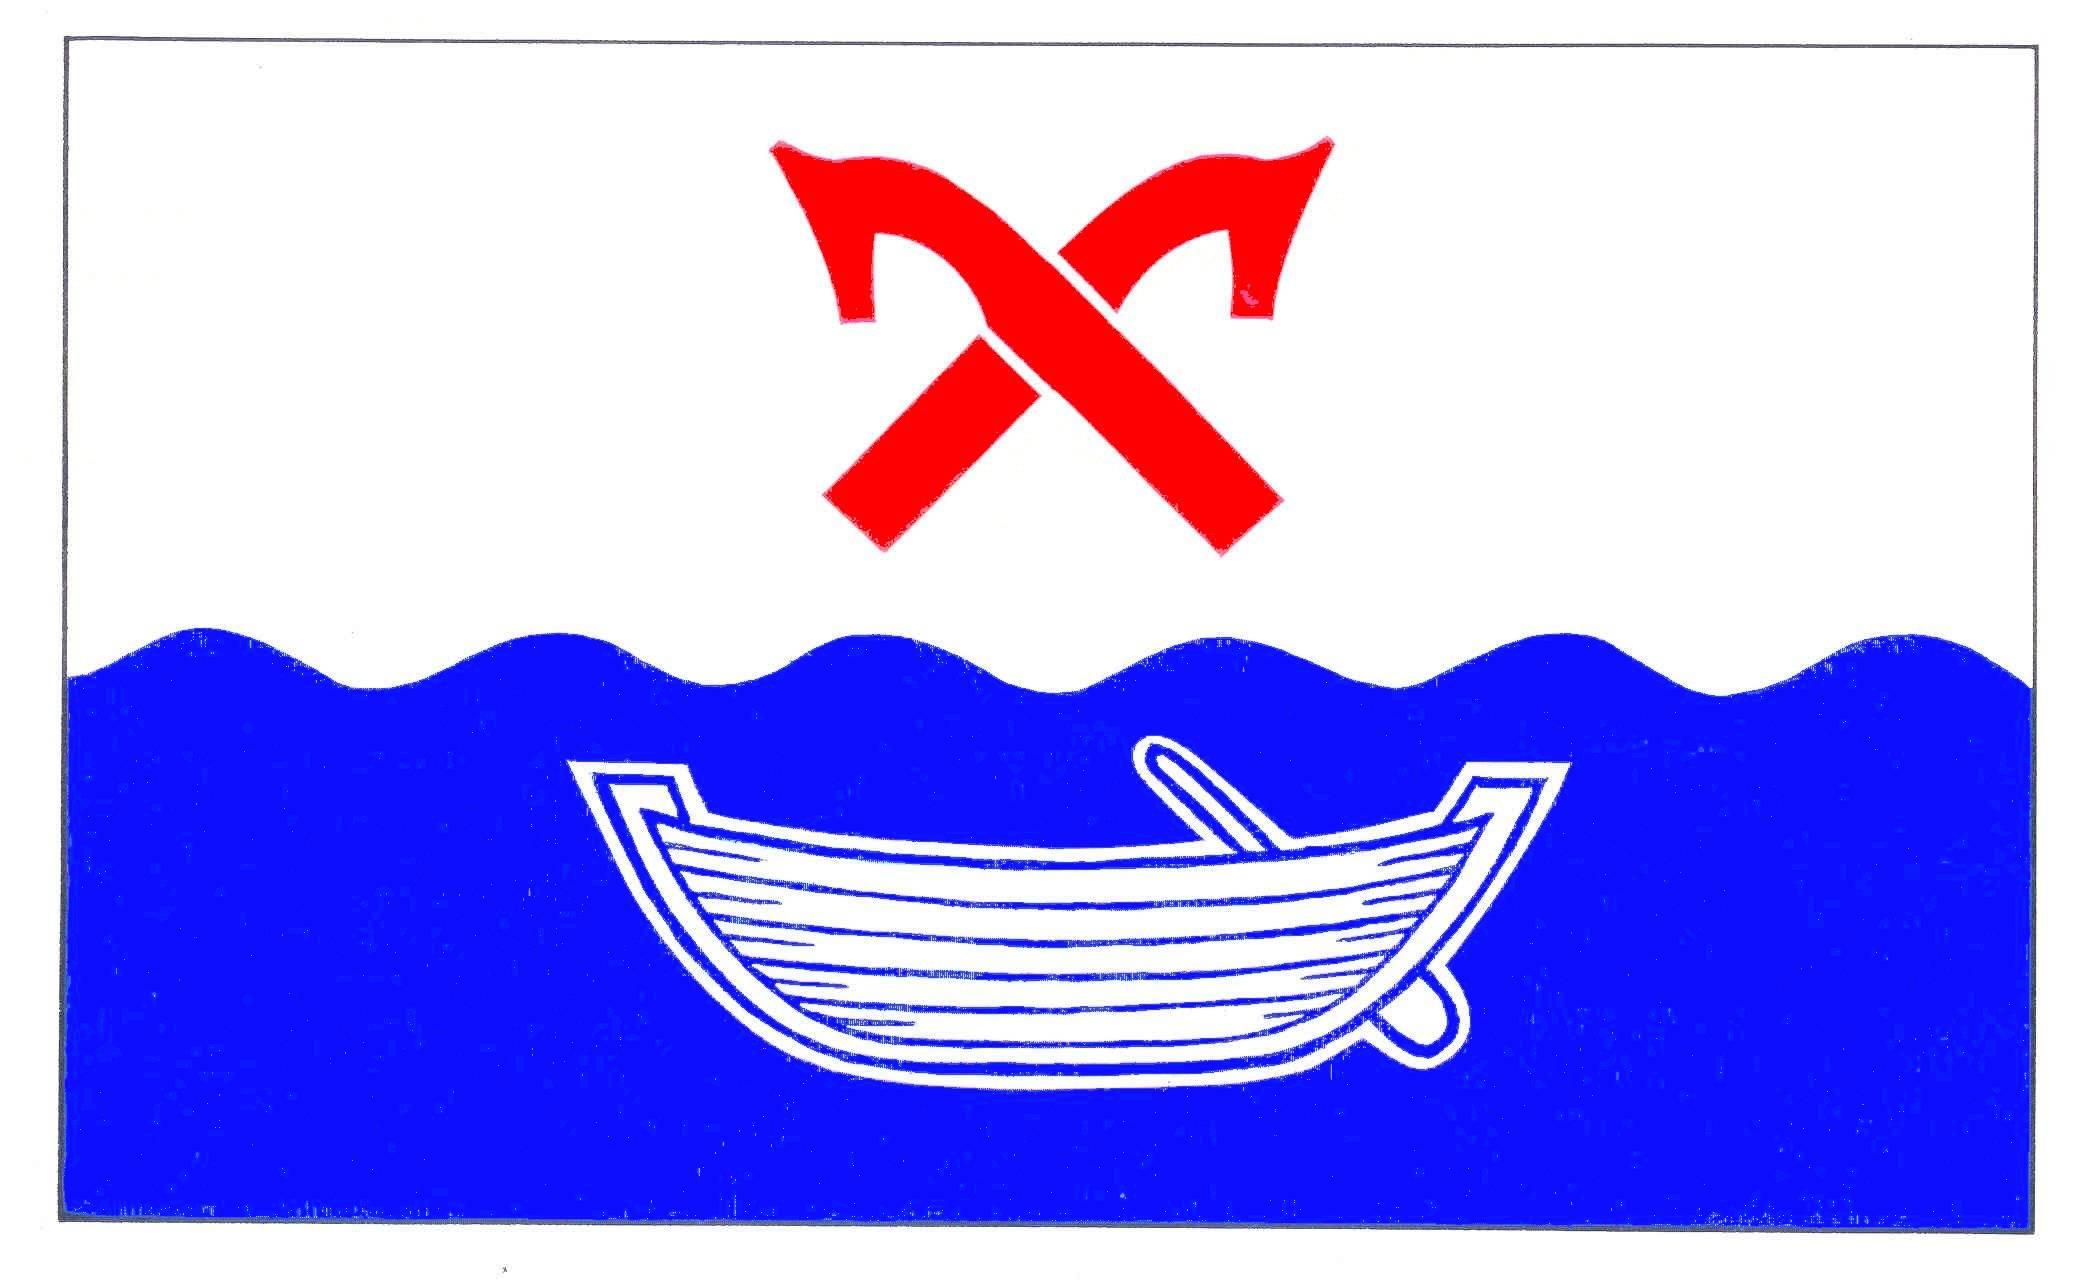 Flagge GemeindeDörnick, Kreis Plön